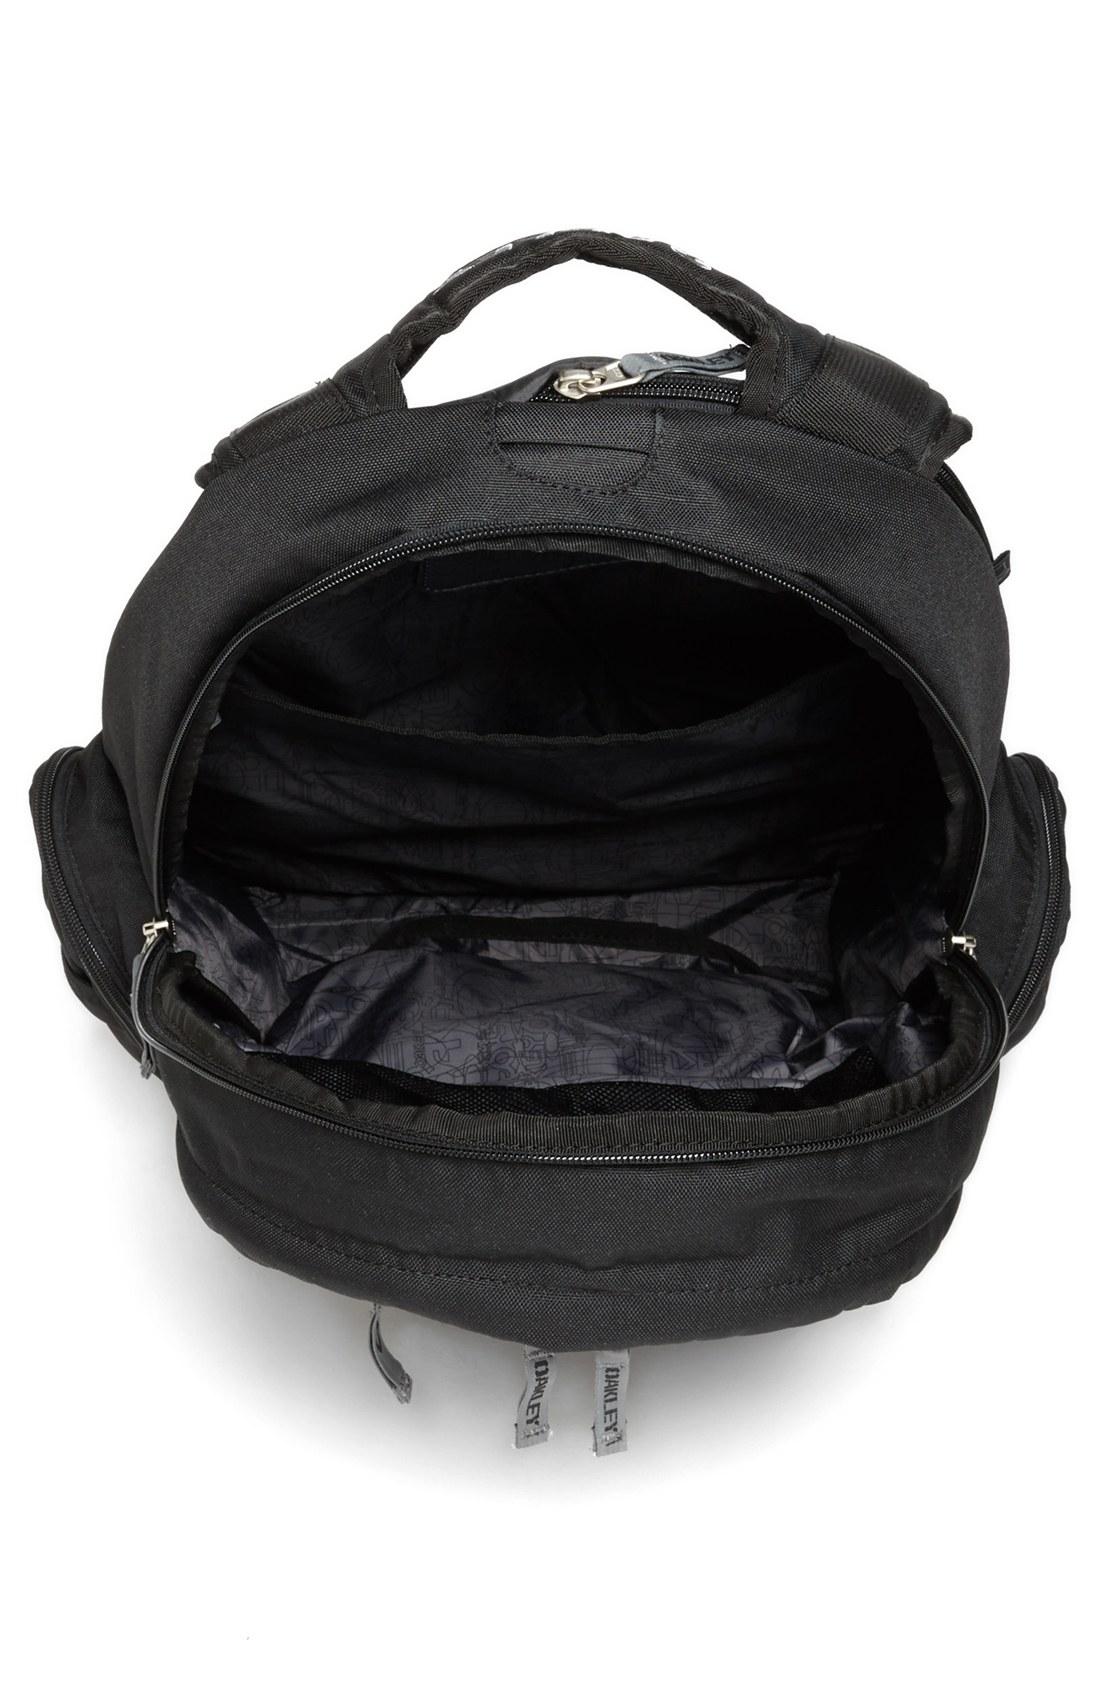 0545ead795 Oakley Arsenal Backpack Black « Heritage Malta